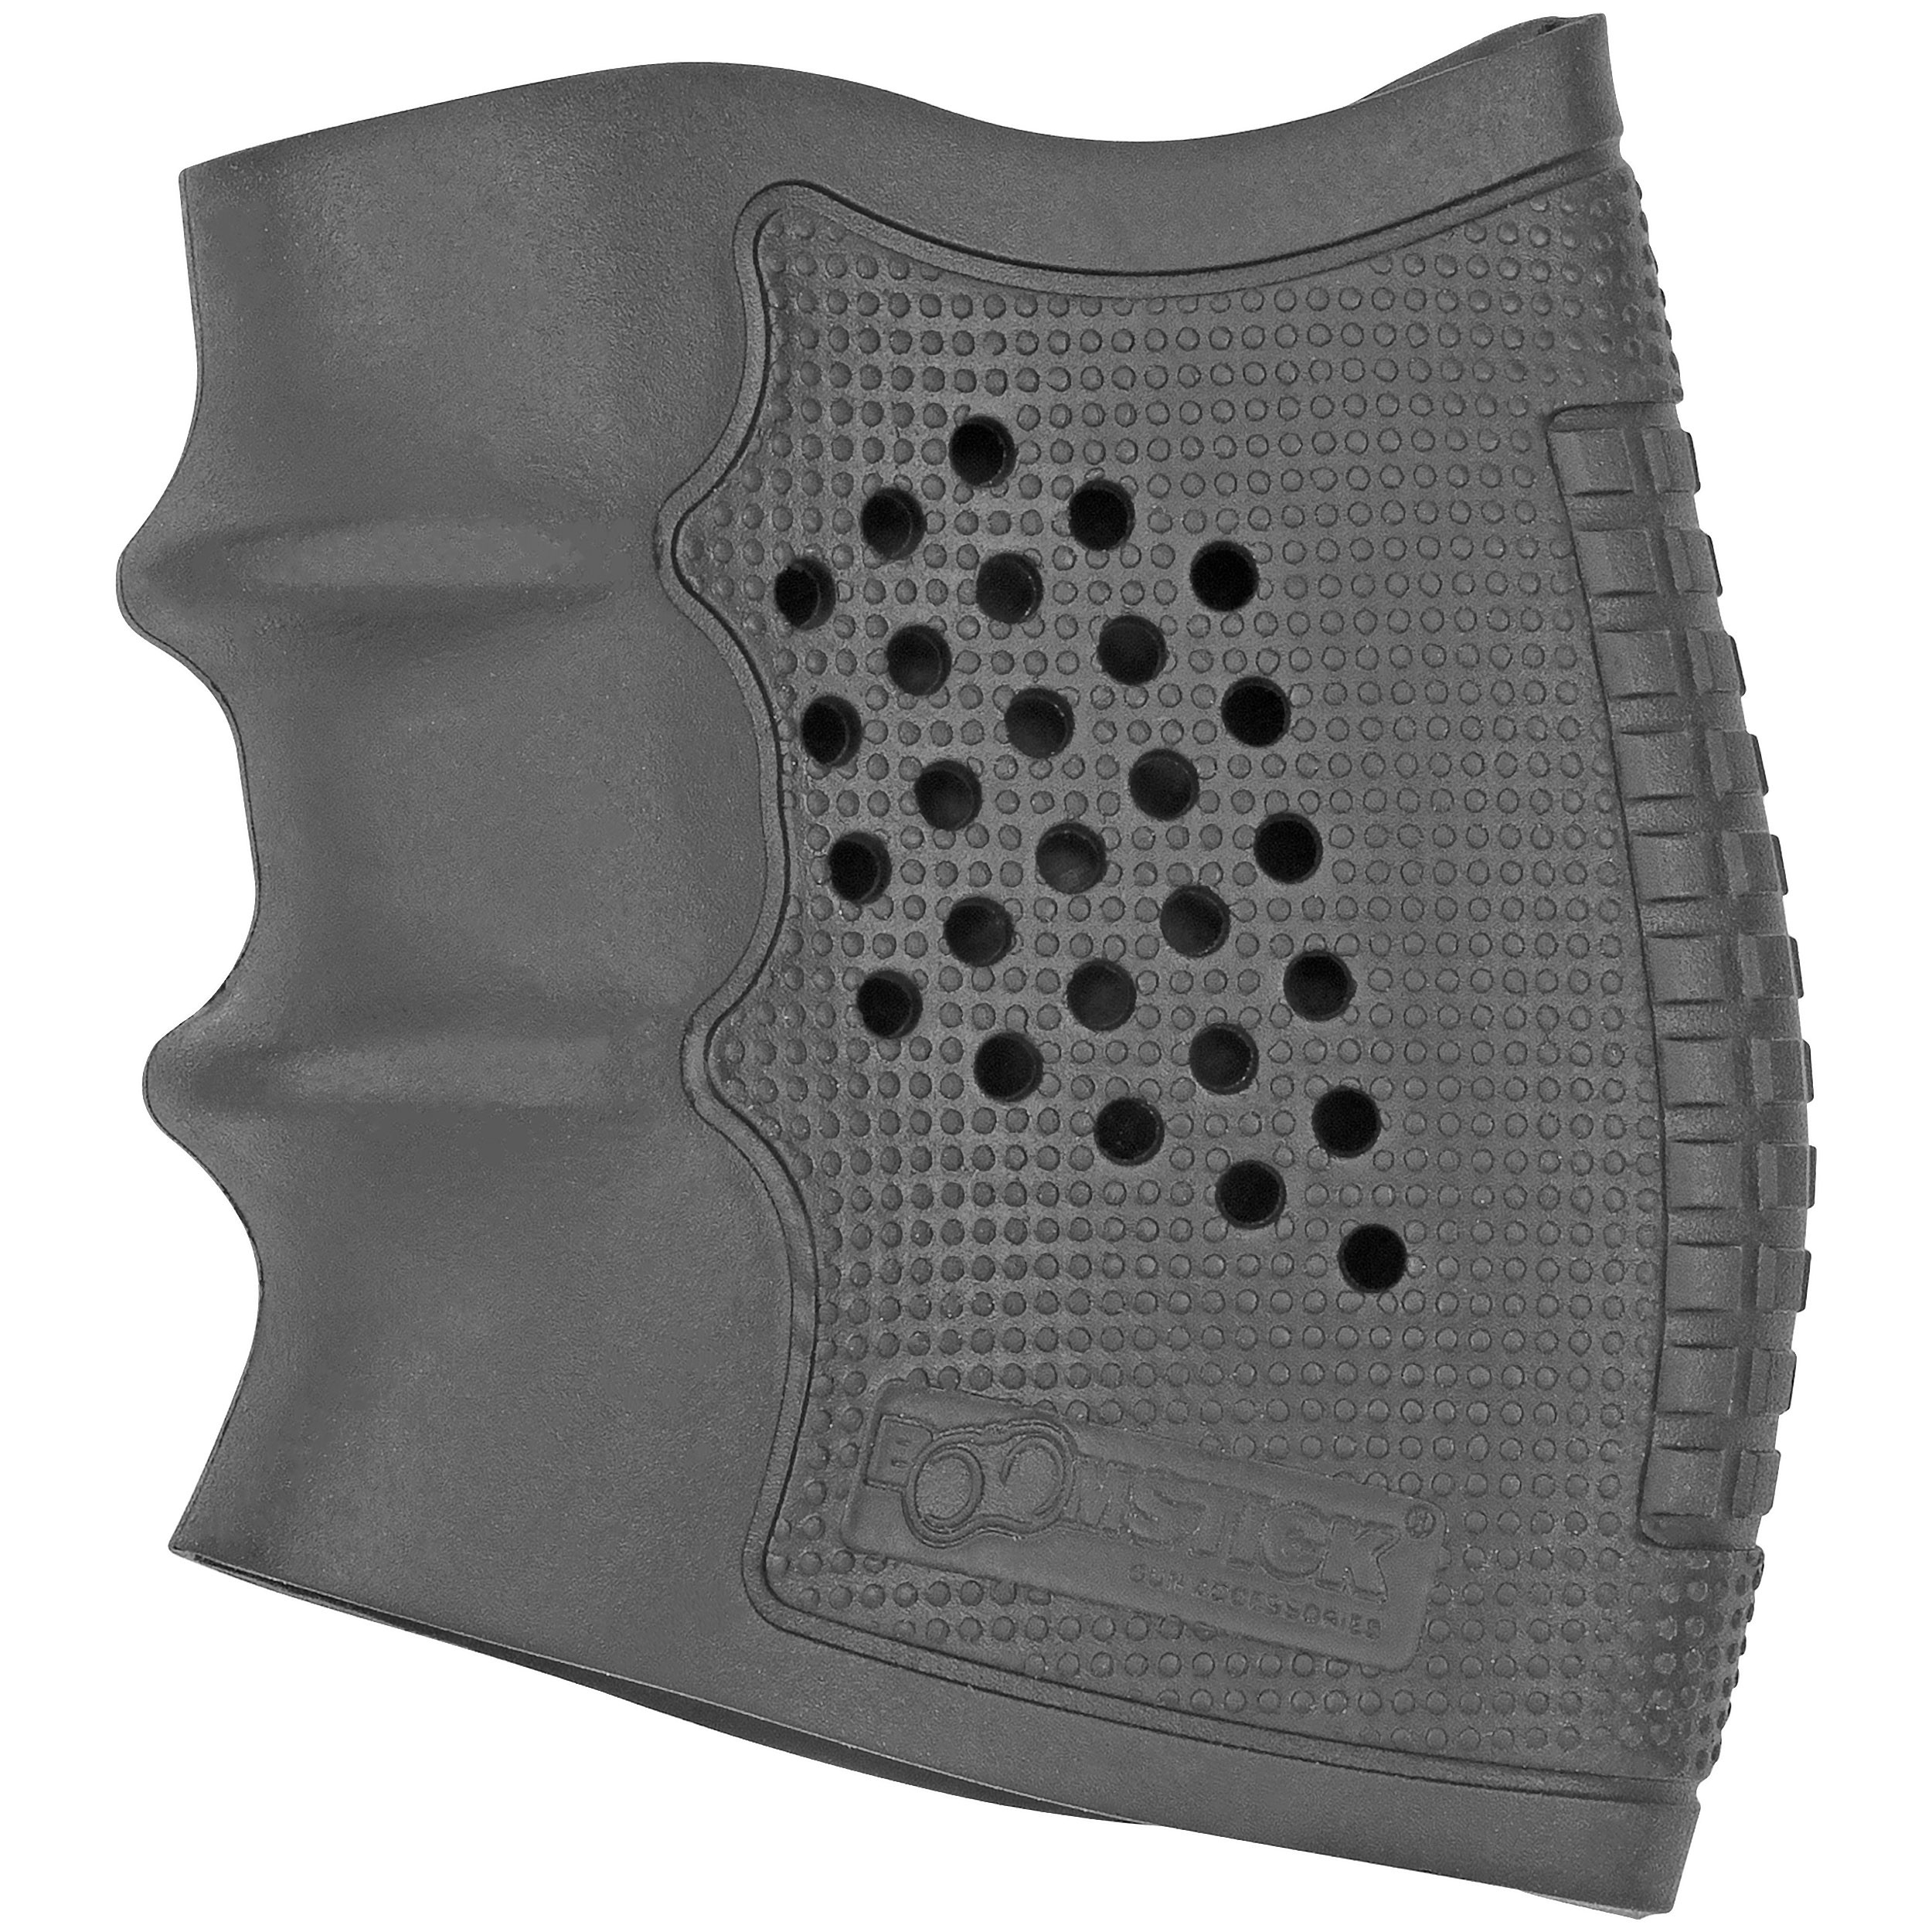 BOOMSTICK Tactical Grip Glove Sleeve Fits: Sig 220, 226, 228, 229, Mosquito Handguns & Pistols, Black